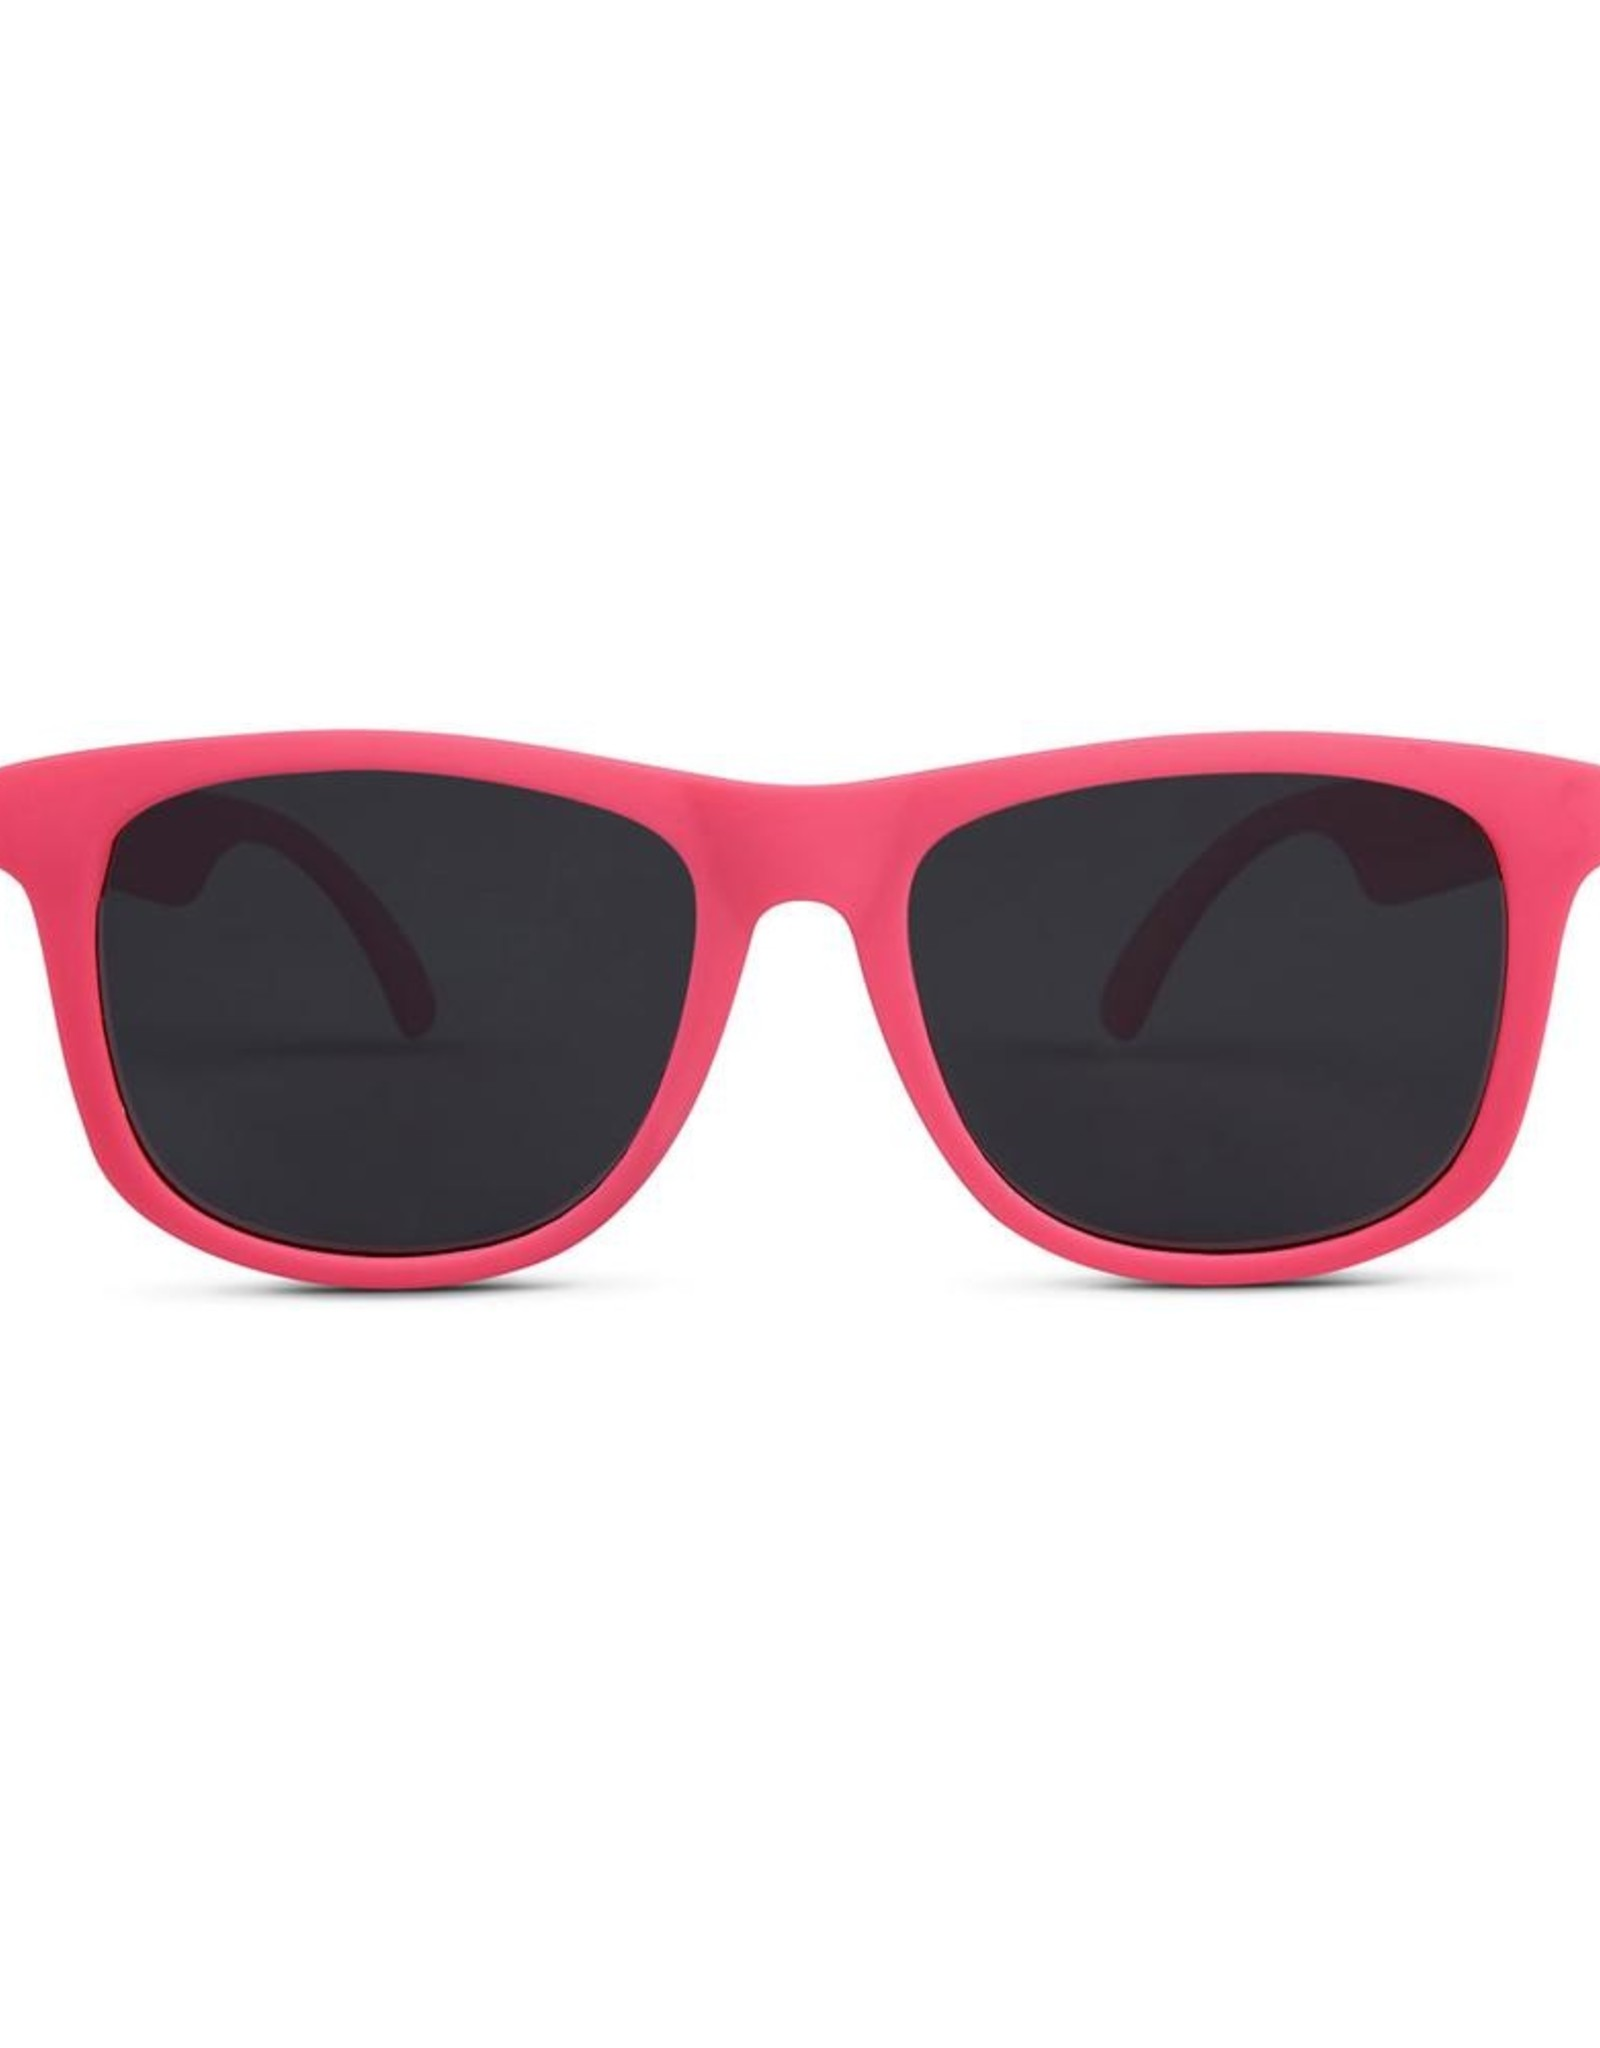 Hipsterkid Hipsterkid Wayfarers zonnebril roze